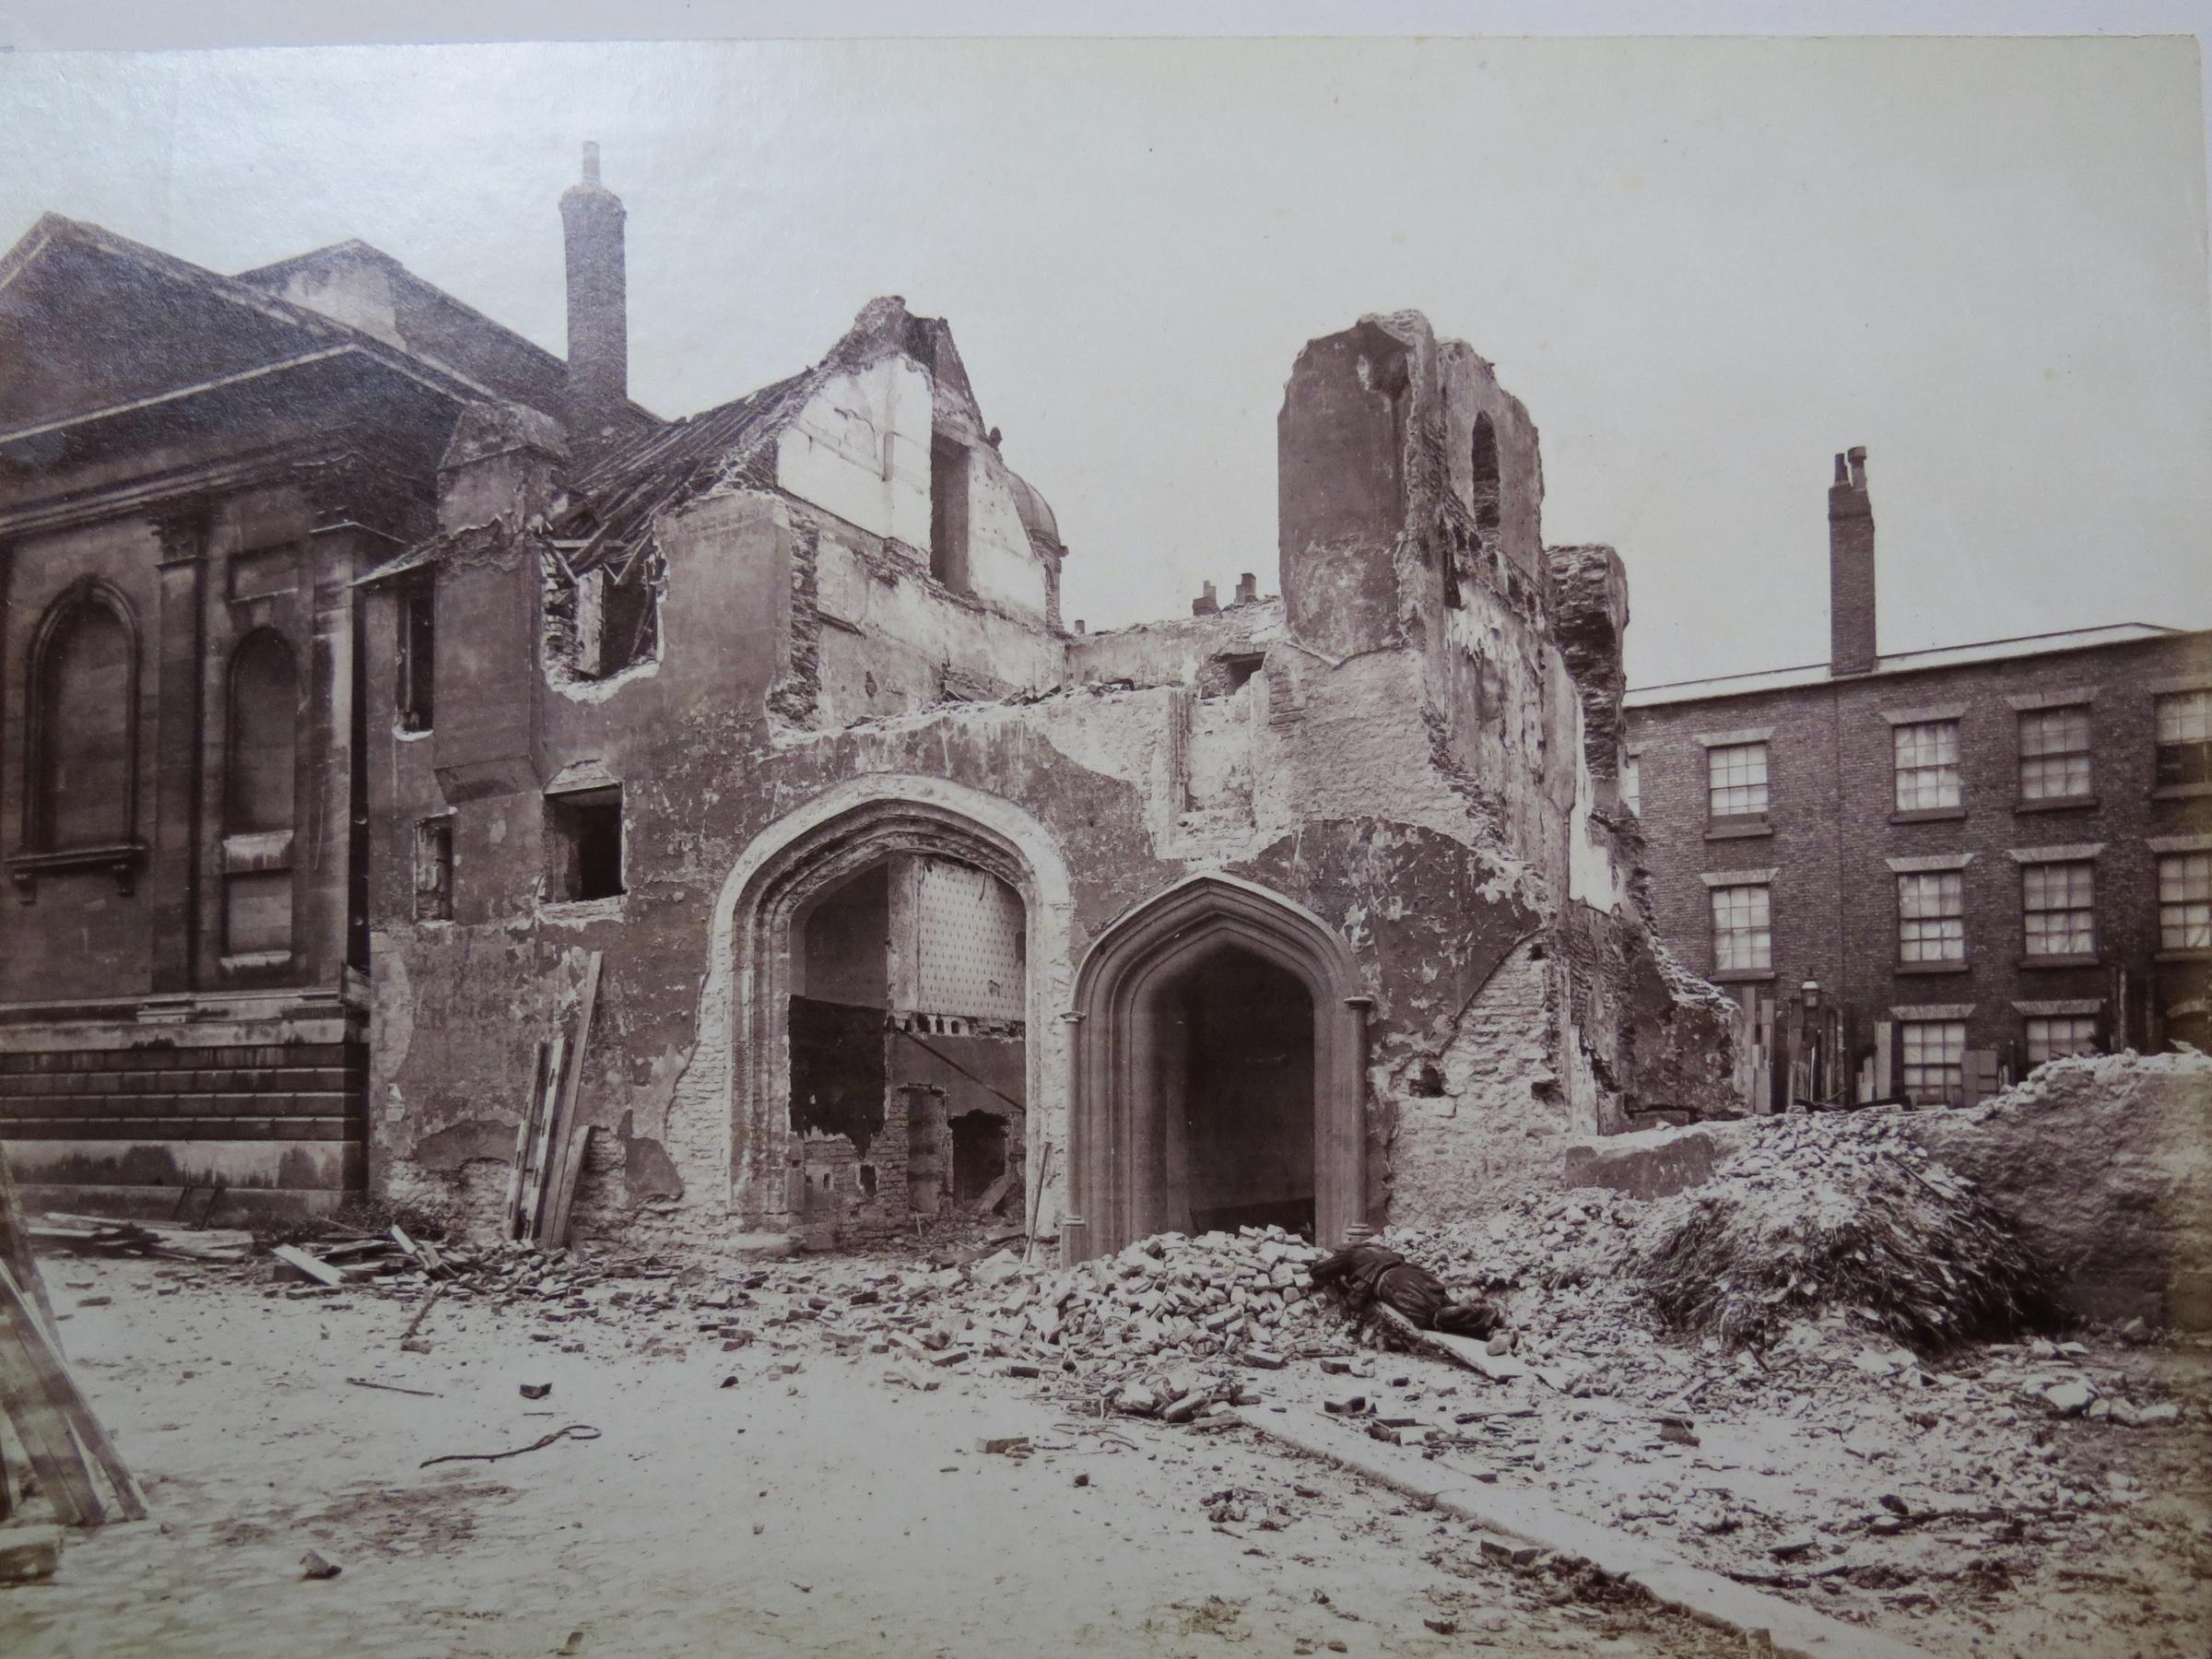 trinity cambridge history essay competition